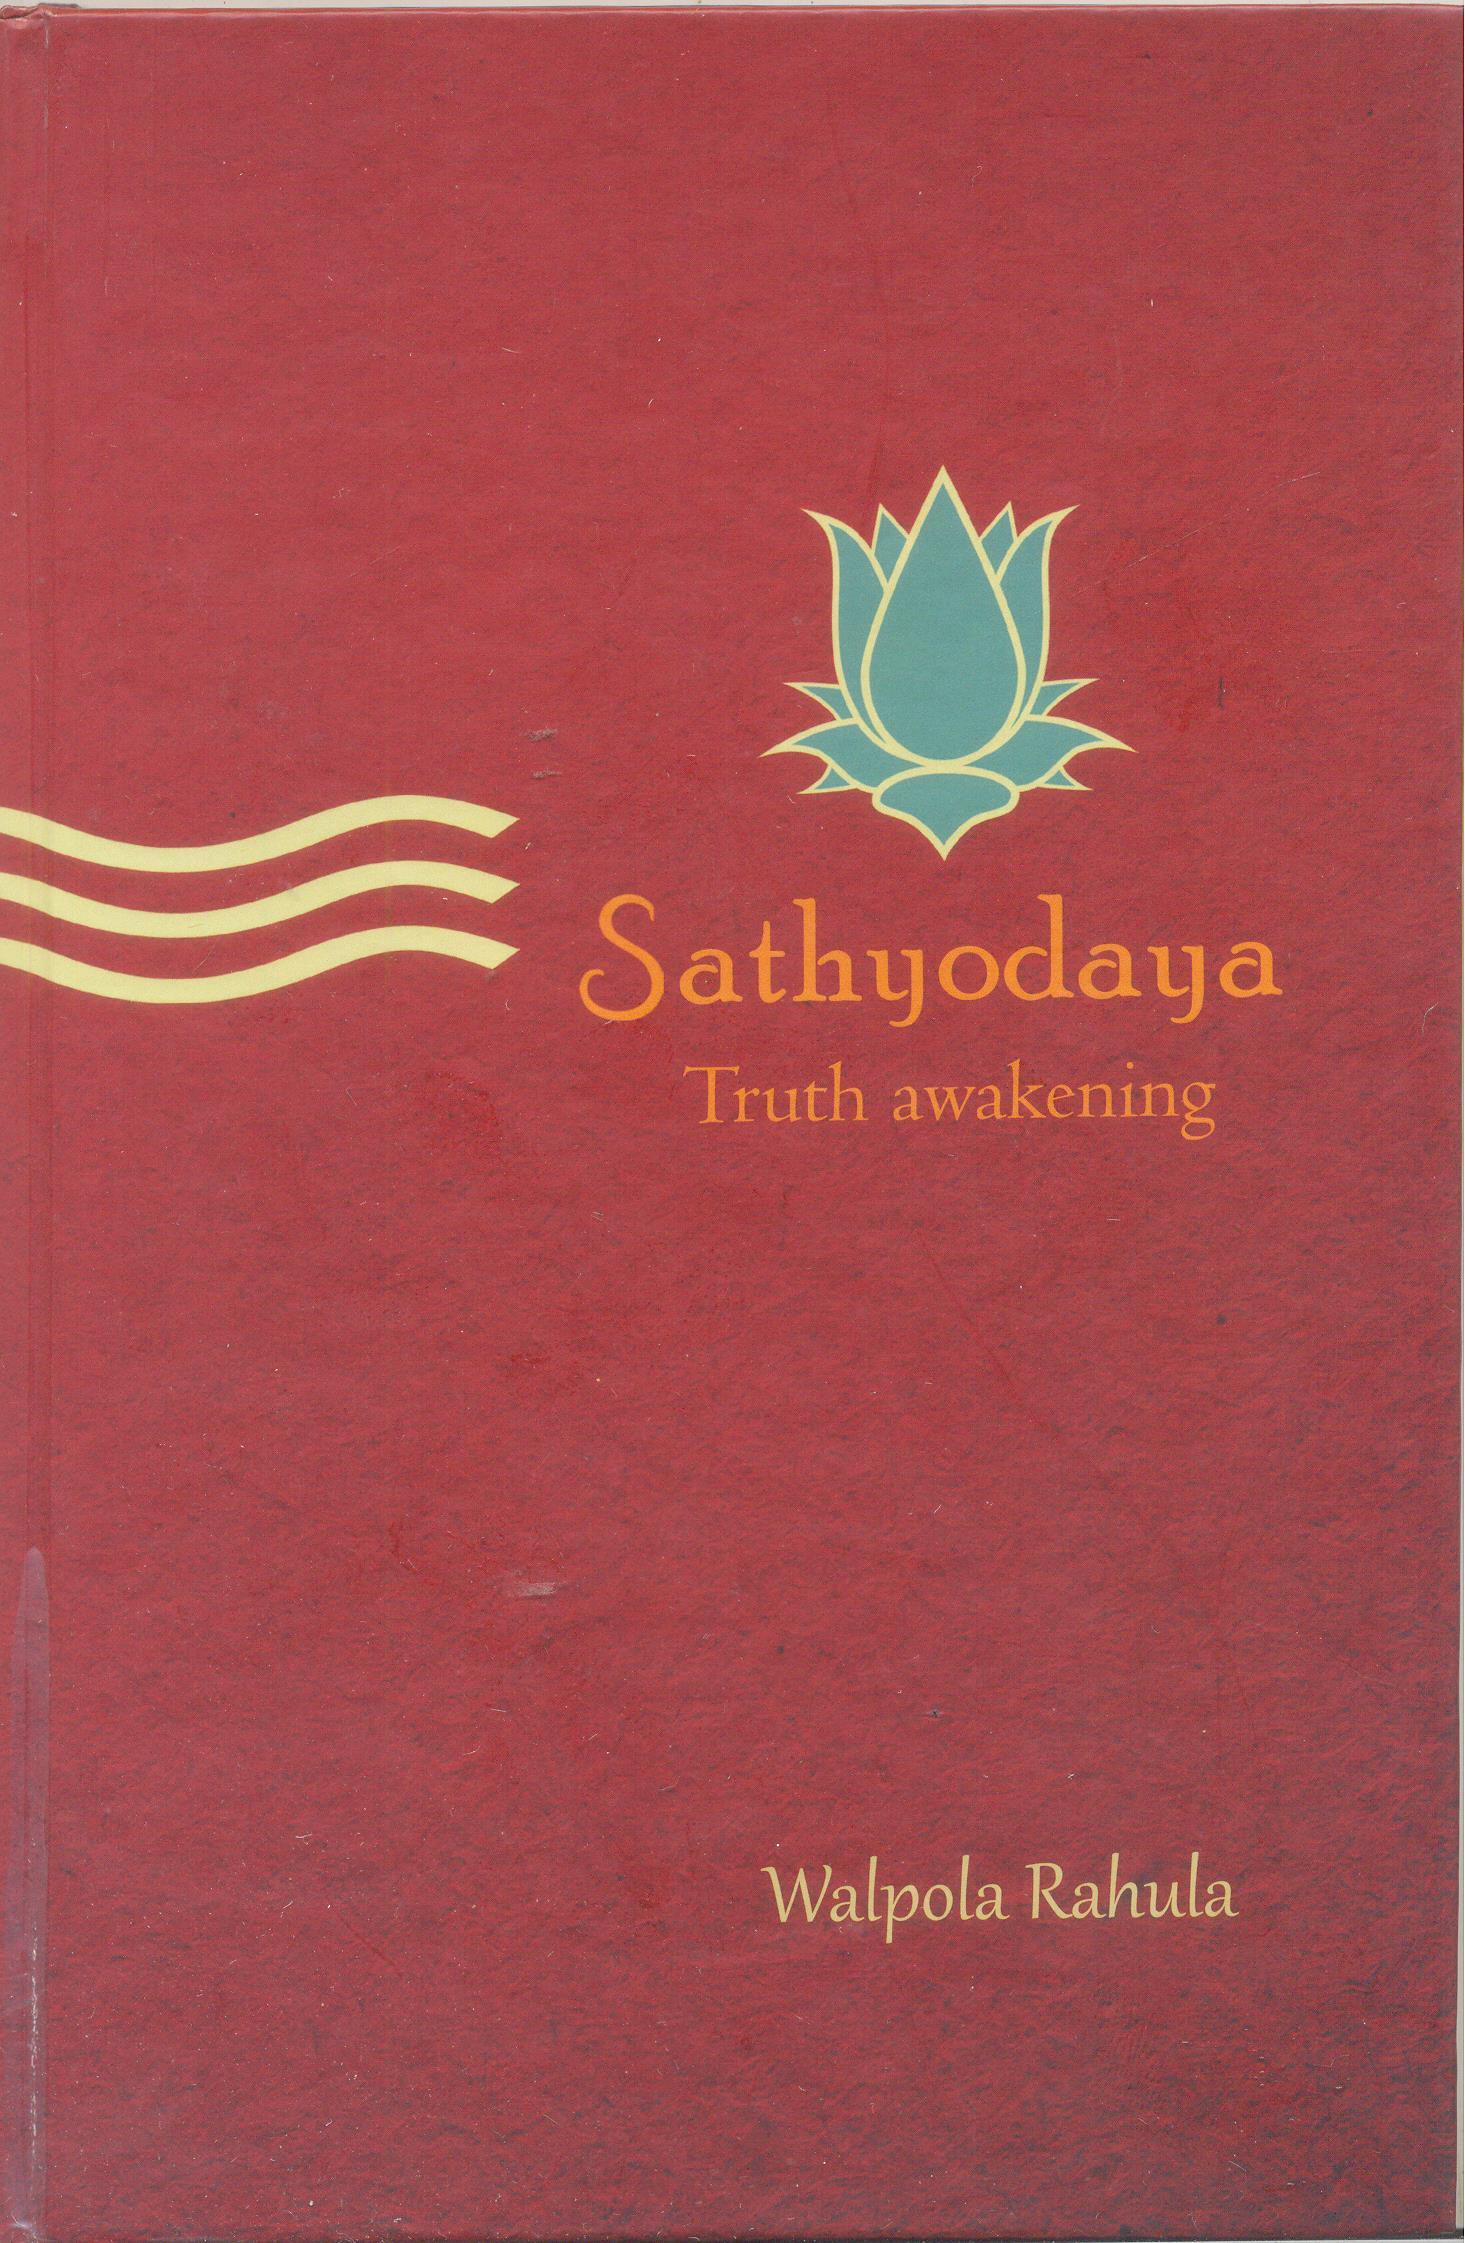 Sathyodaya - Truth Awakening